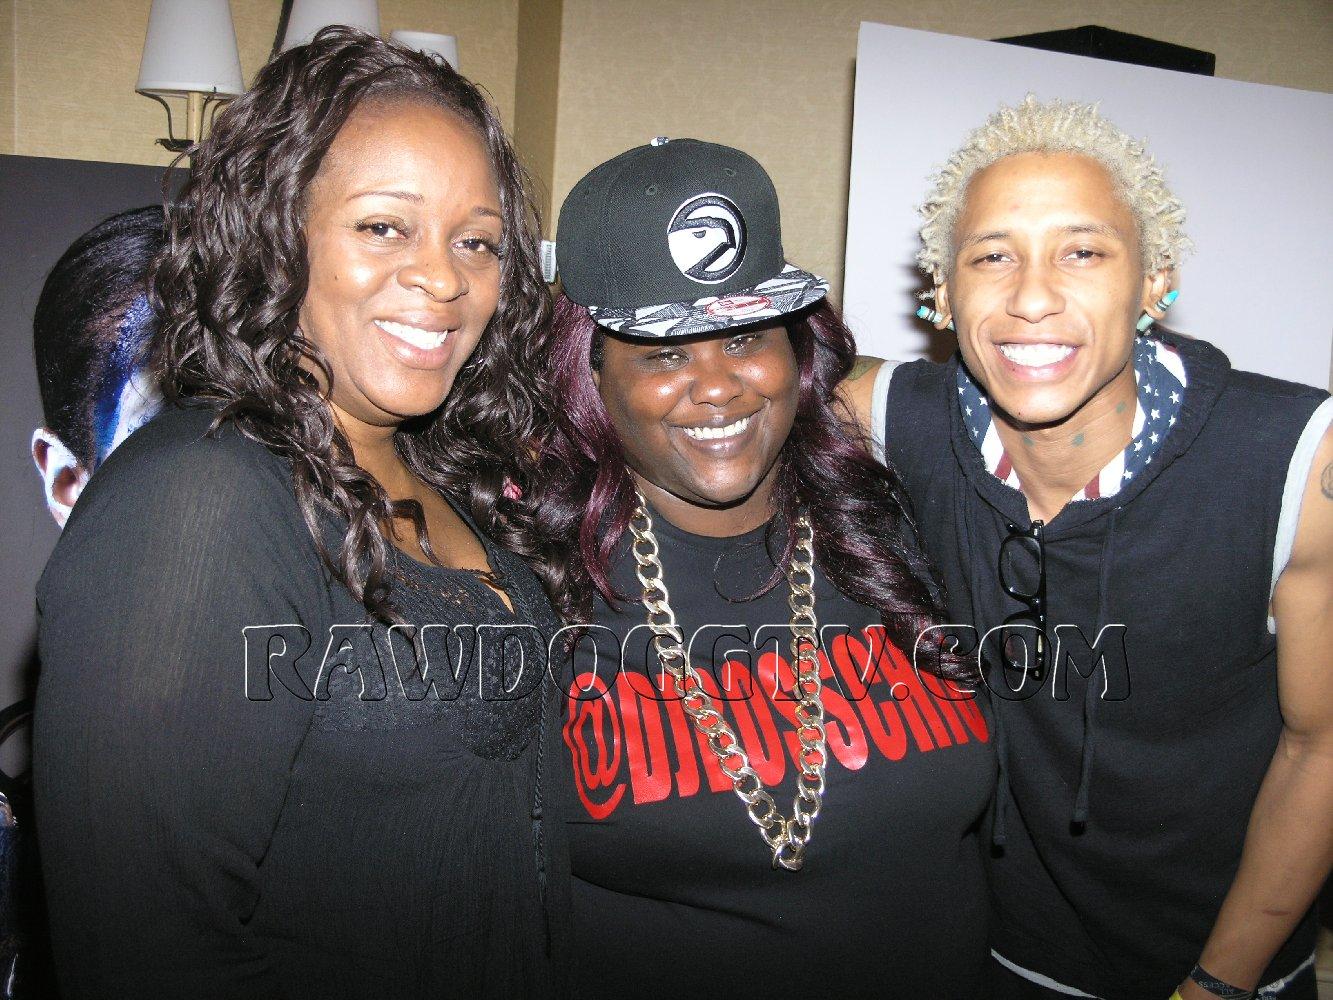 ashley-reid-a3c-ashley-reid-bet-hip-hop-awards-lareid-pebblesaaron-reid-epic-records-meetings-ar-ashley-reid-atlanta-entertainment-rawdoggtv-305-490-2182-39